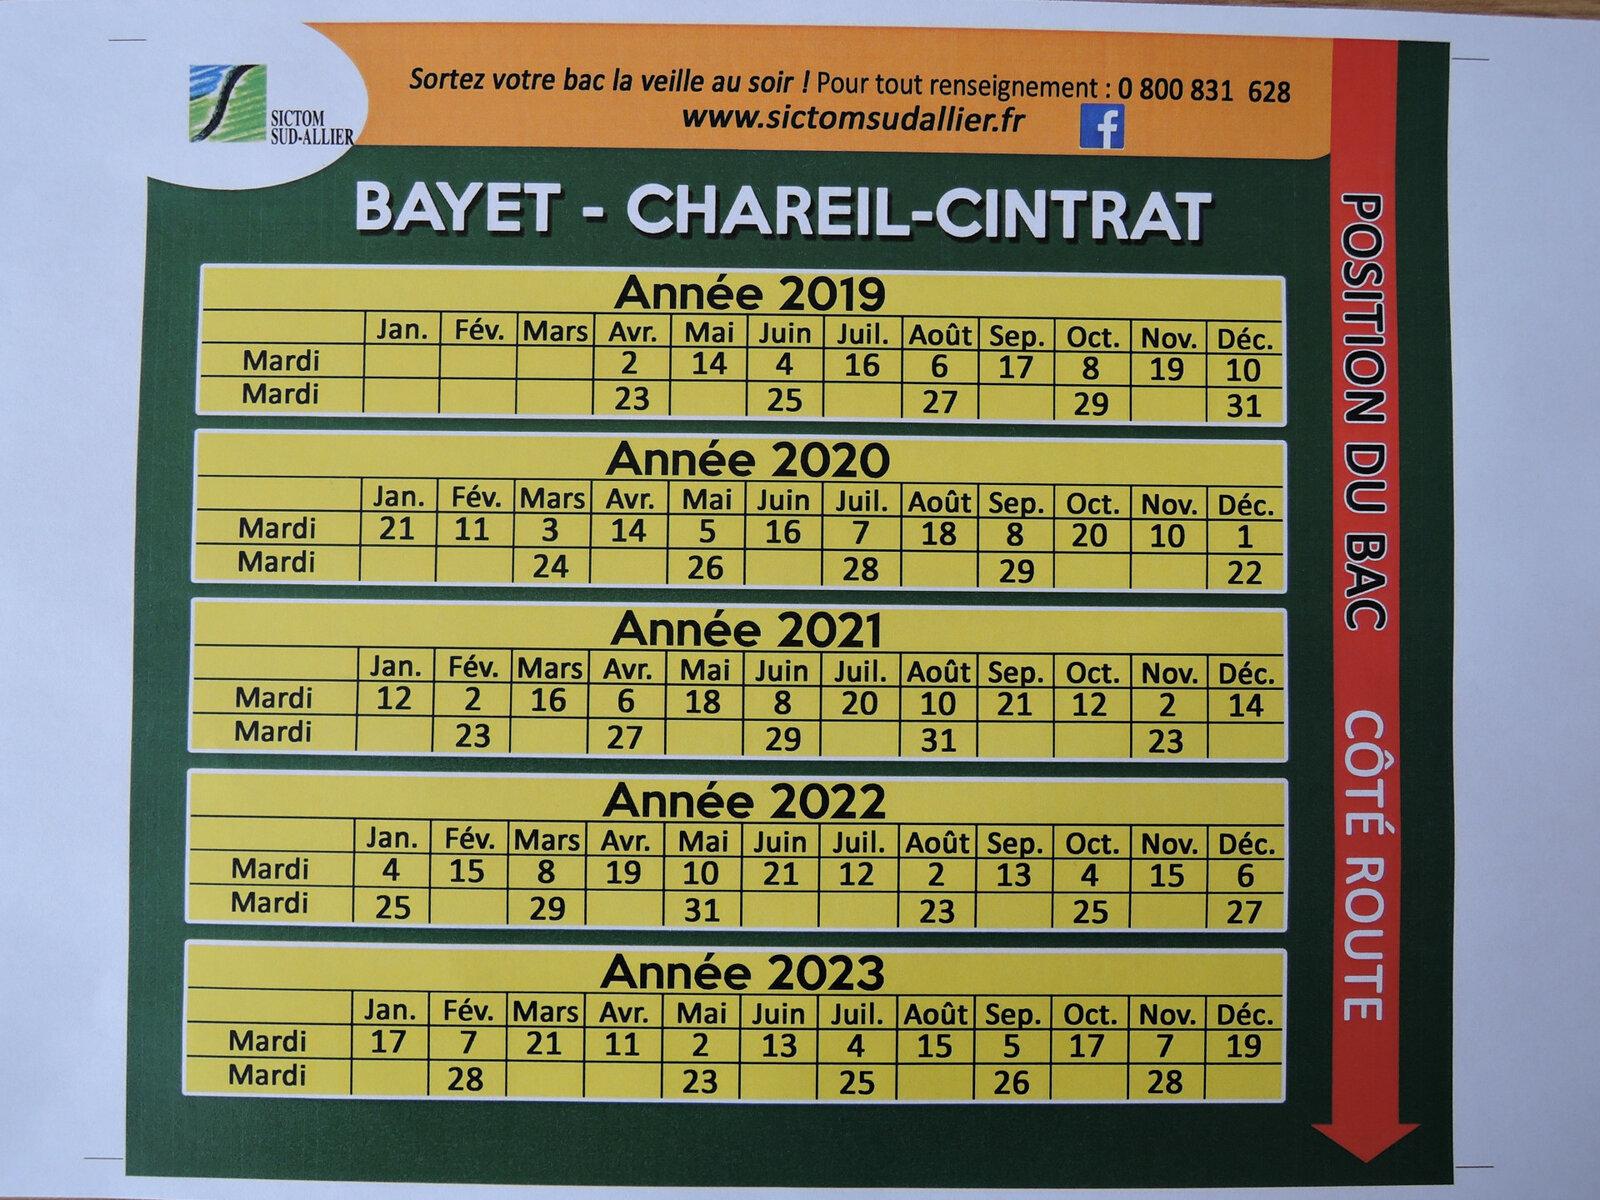 Calendrier Brocante Allier 2021 Calendrier Brocante Allier 2020 | Calendrier 2020 modeltreindagen